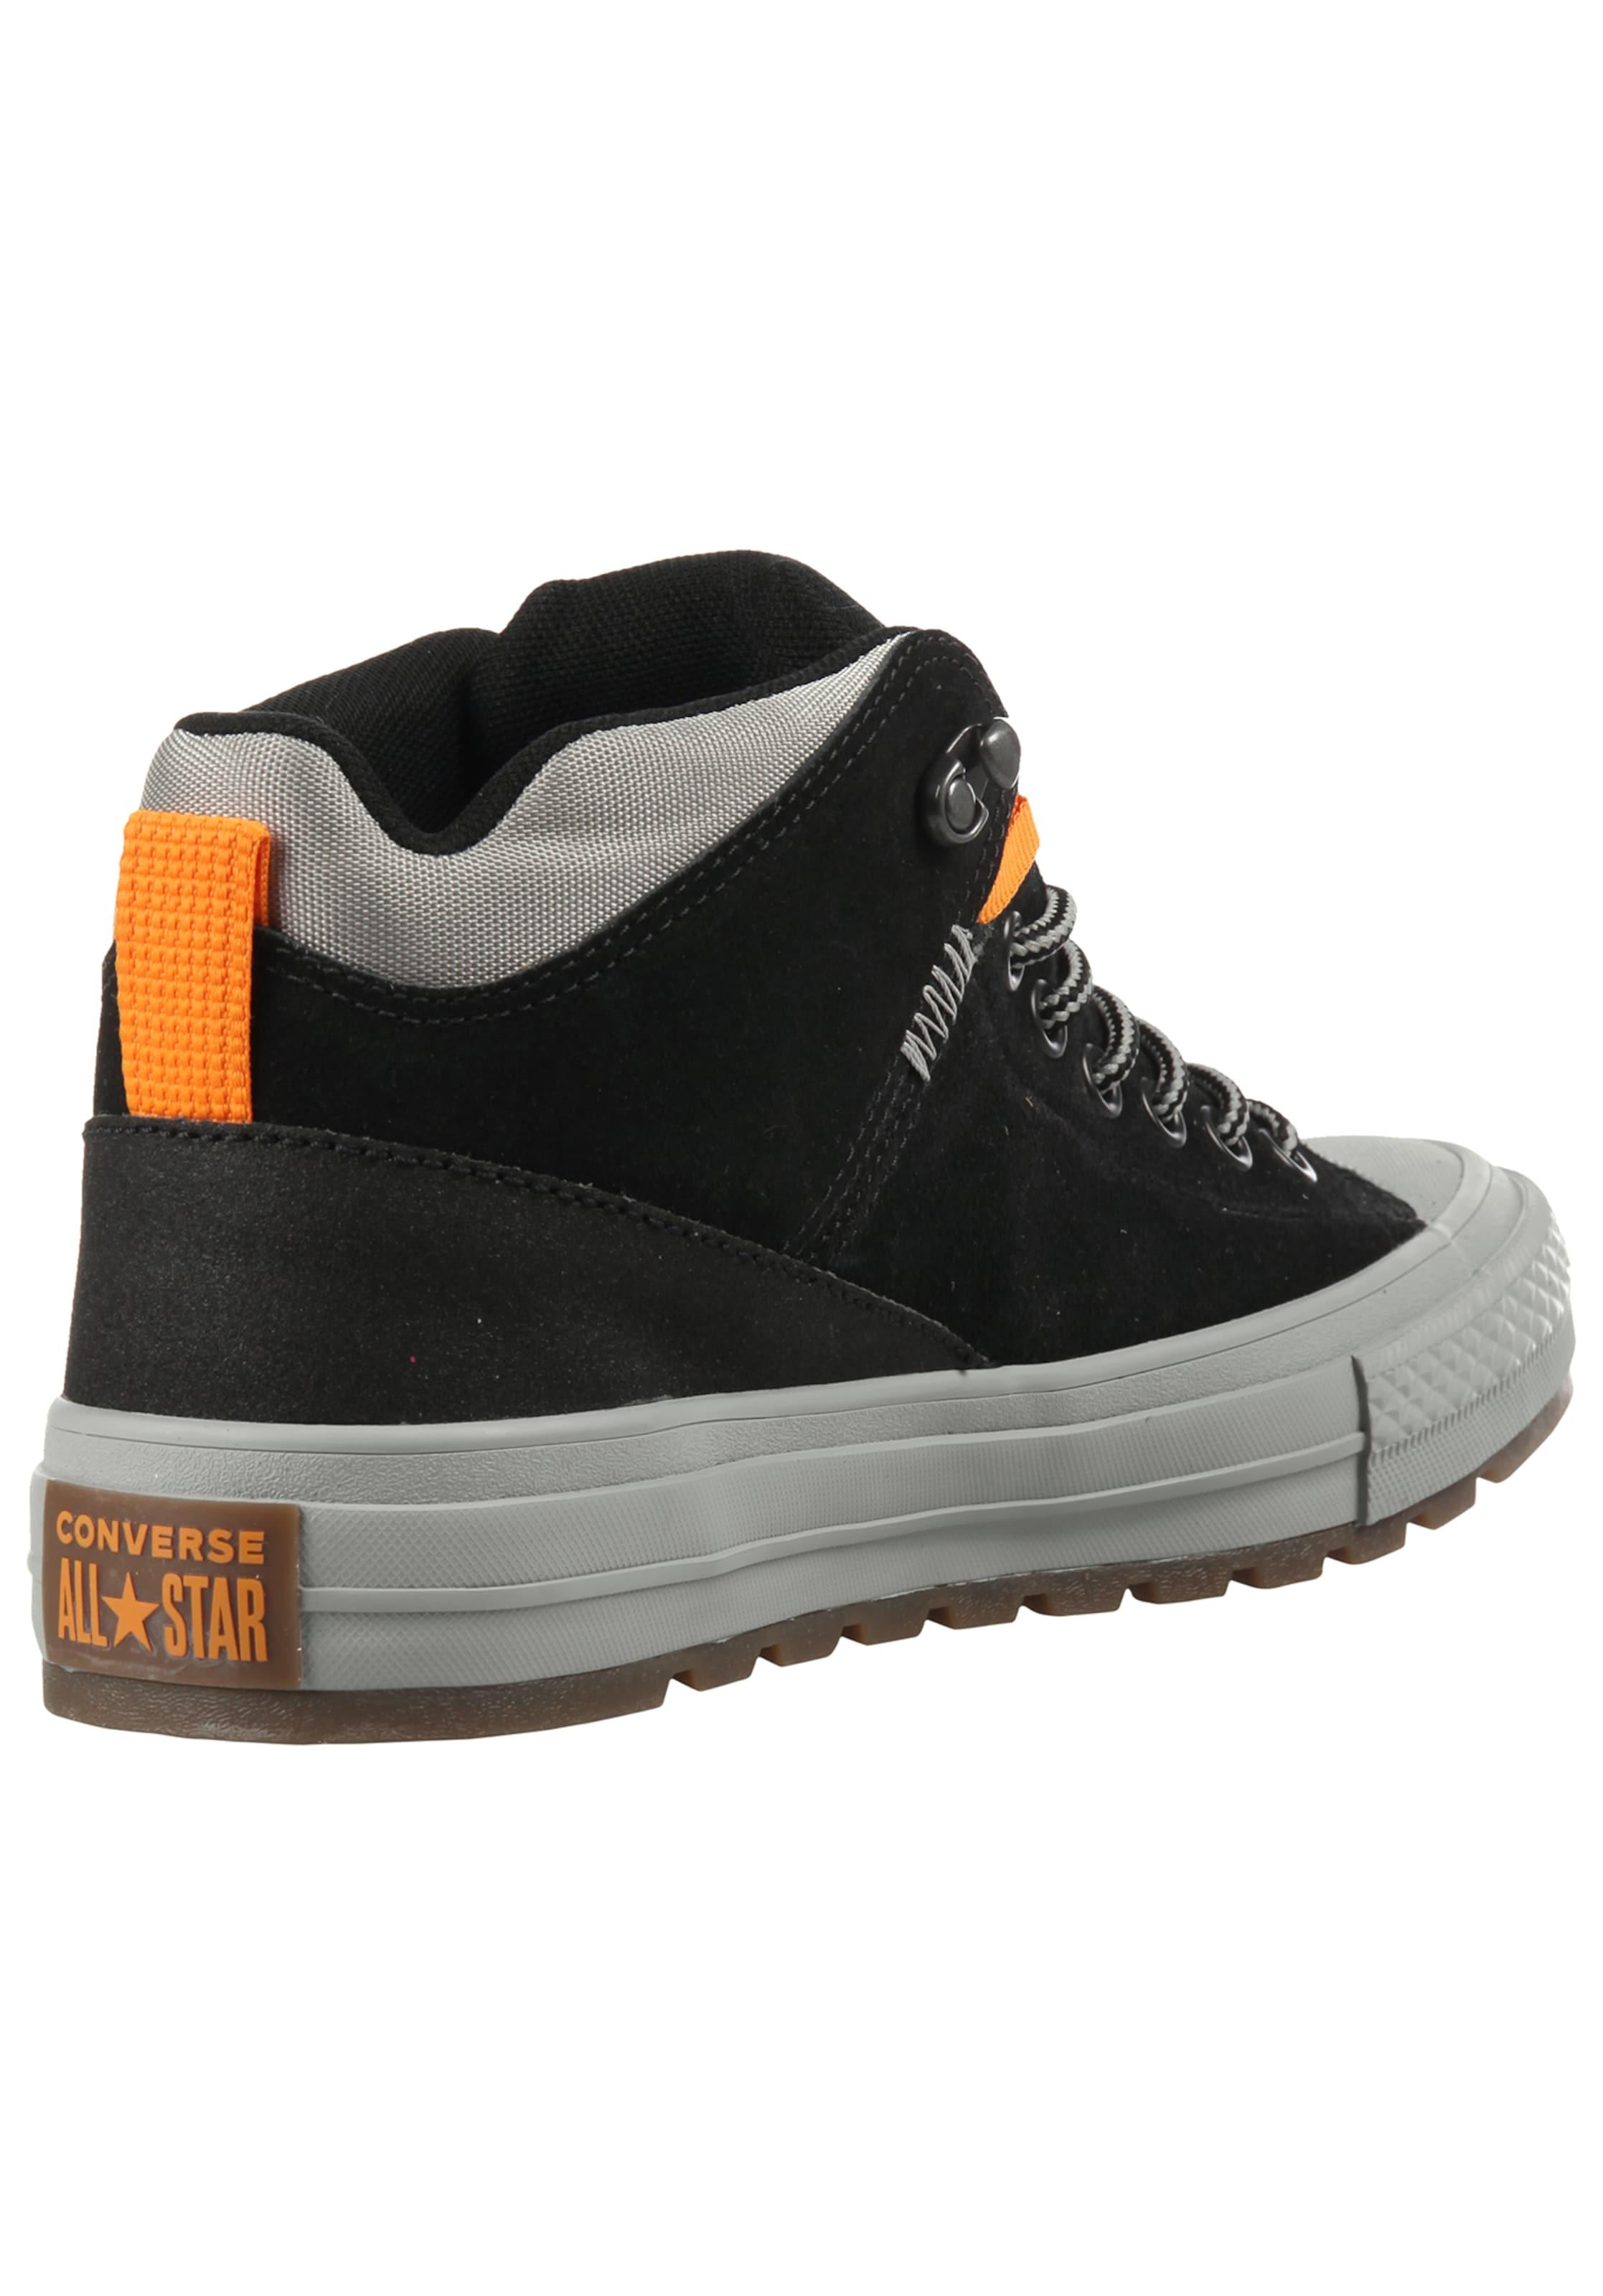 Star Hi' SchwarzWeiß Converse Sneaker Street In All 'chuck Taylor nO0wNX8Pk